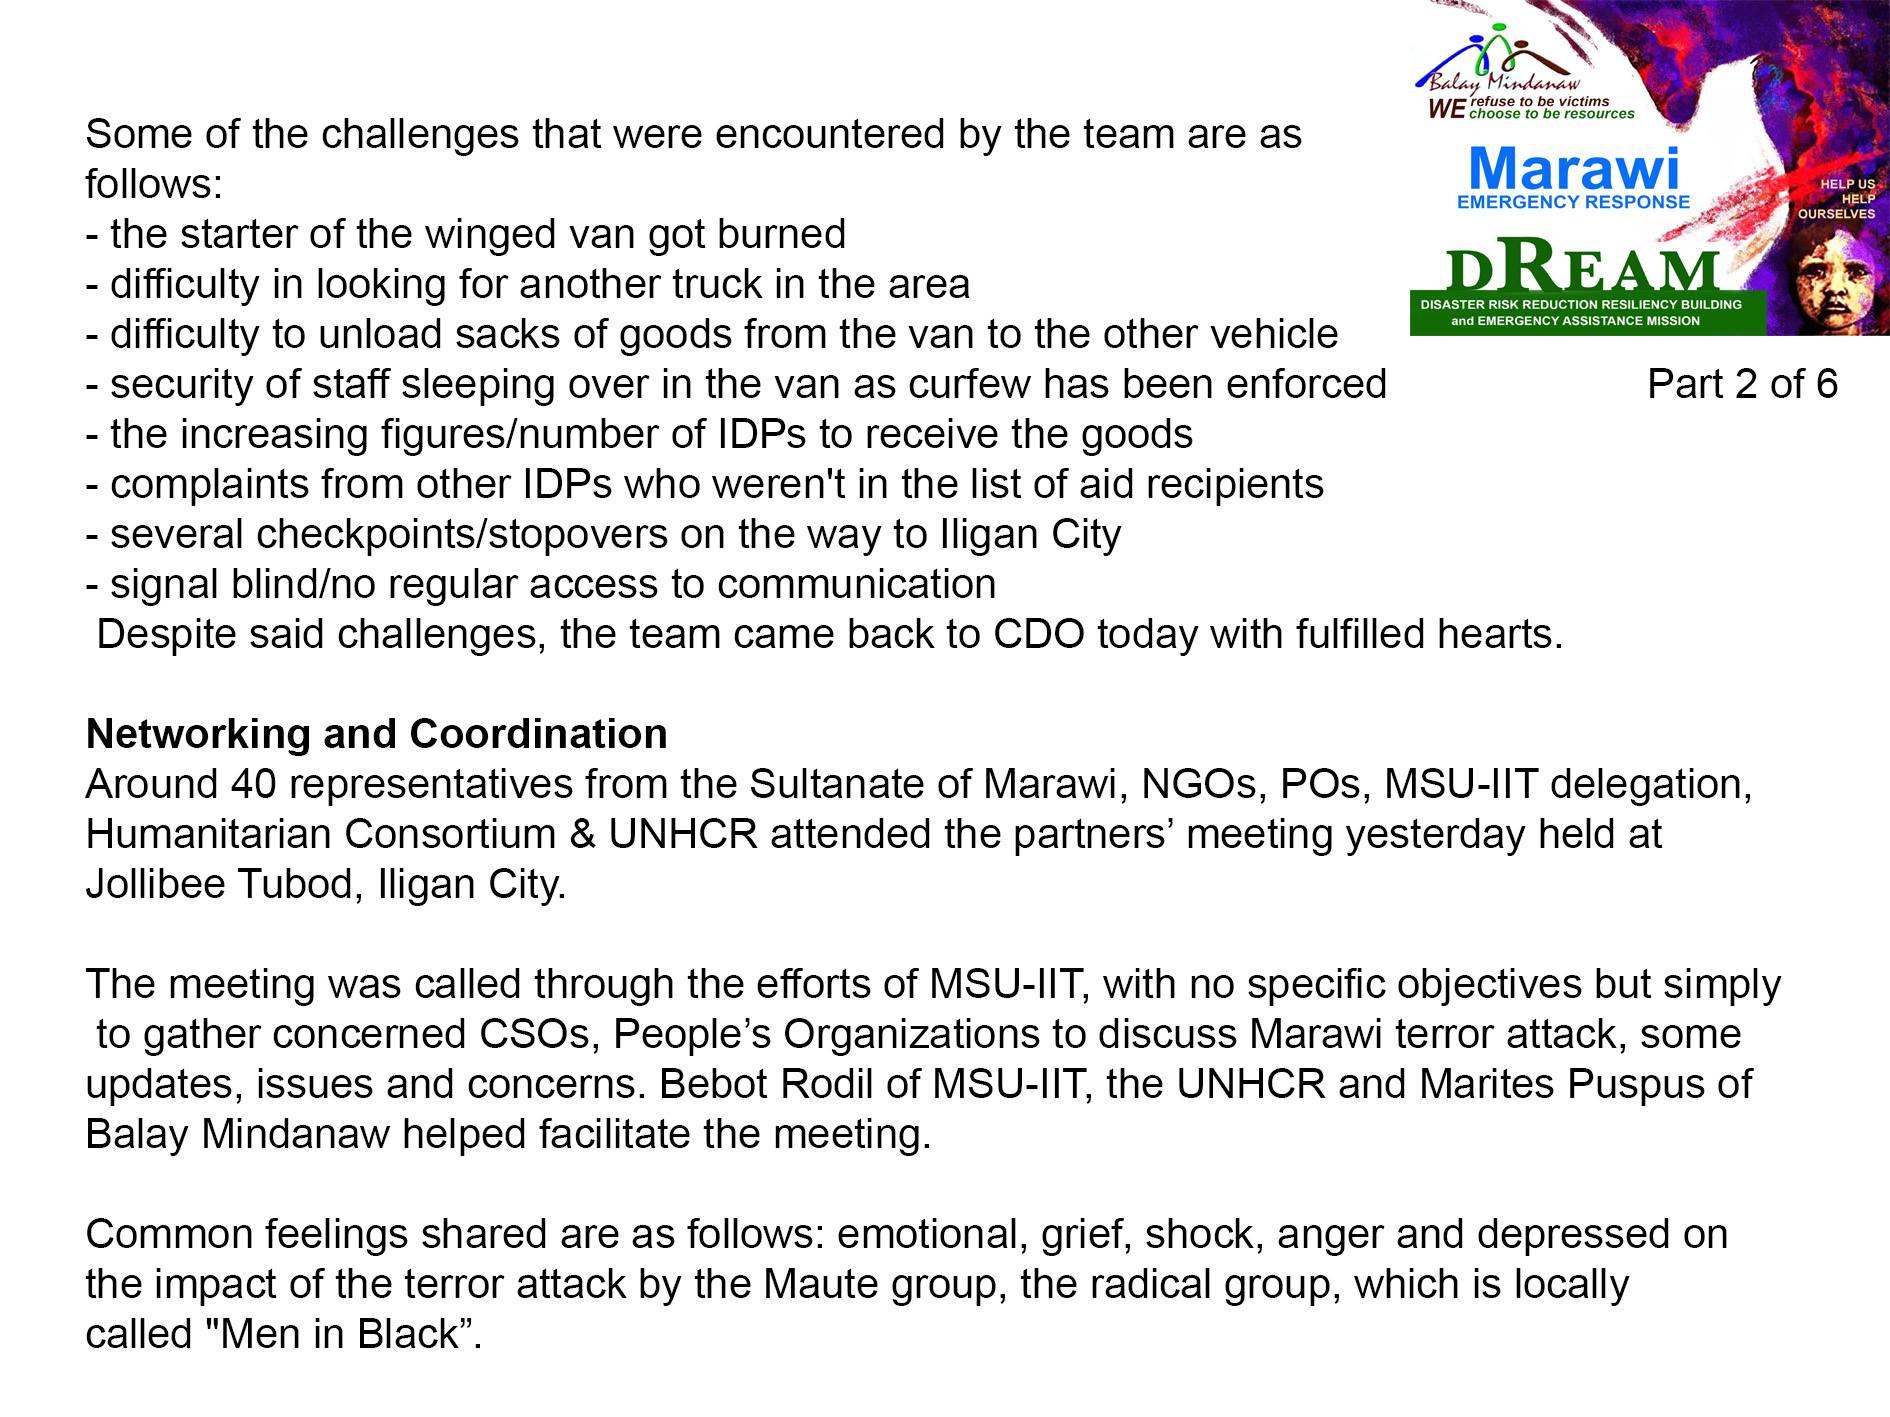 jun12017-Marawi-update-6